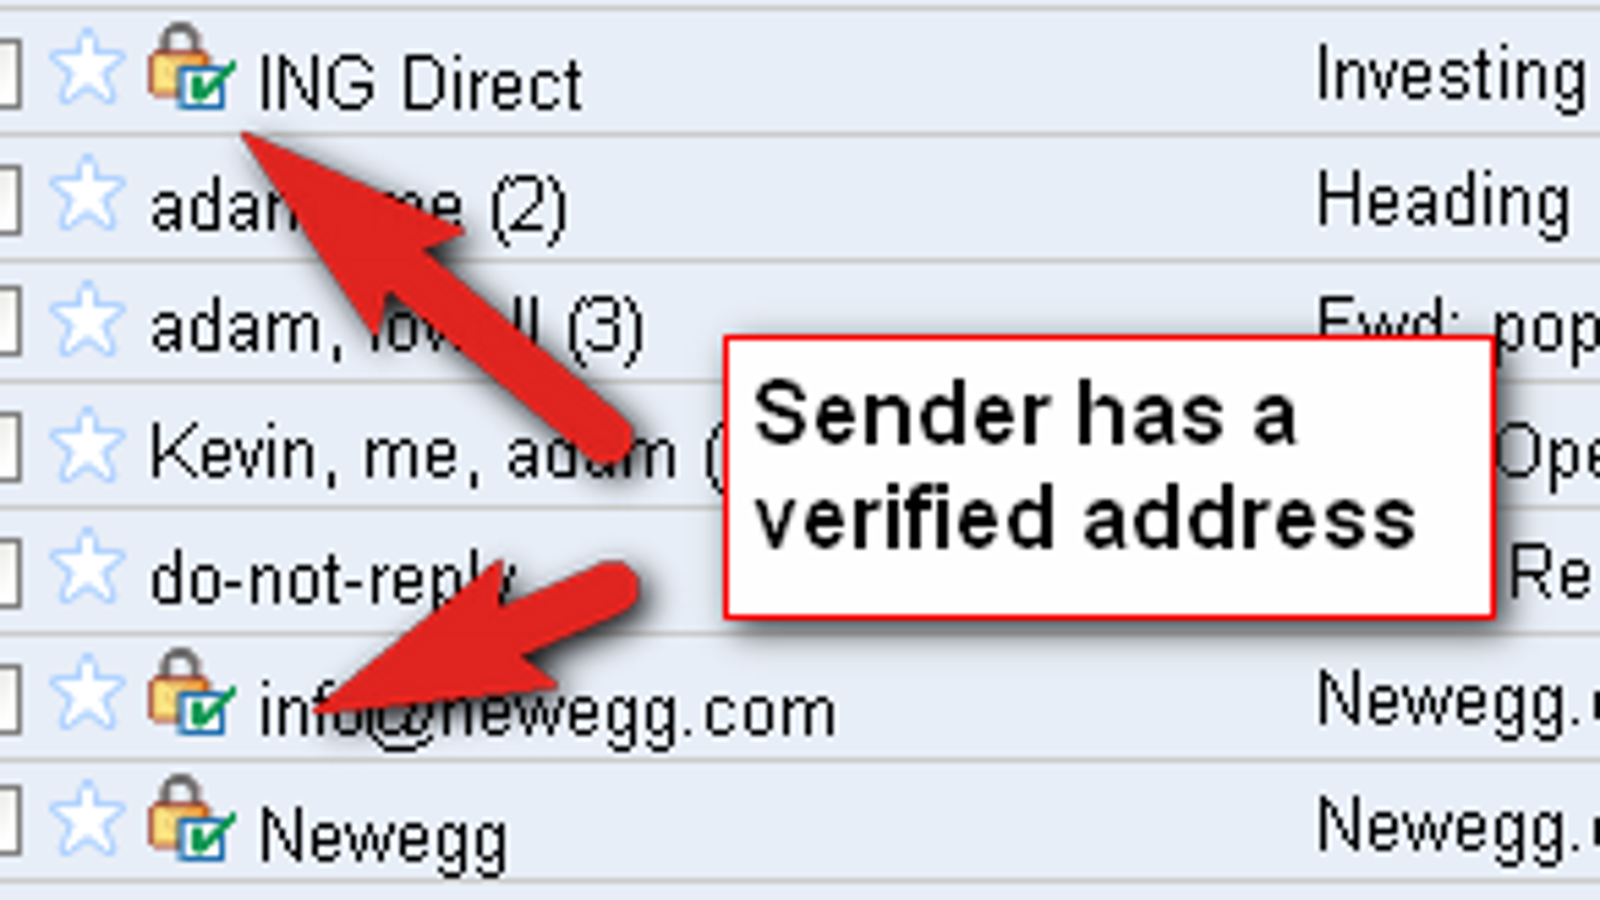 Iconix Truemark Email Identification Verifies Senders